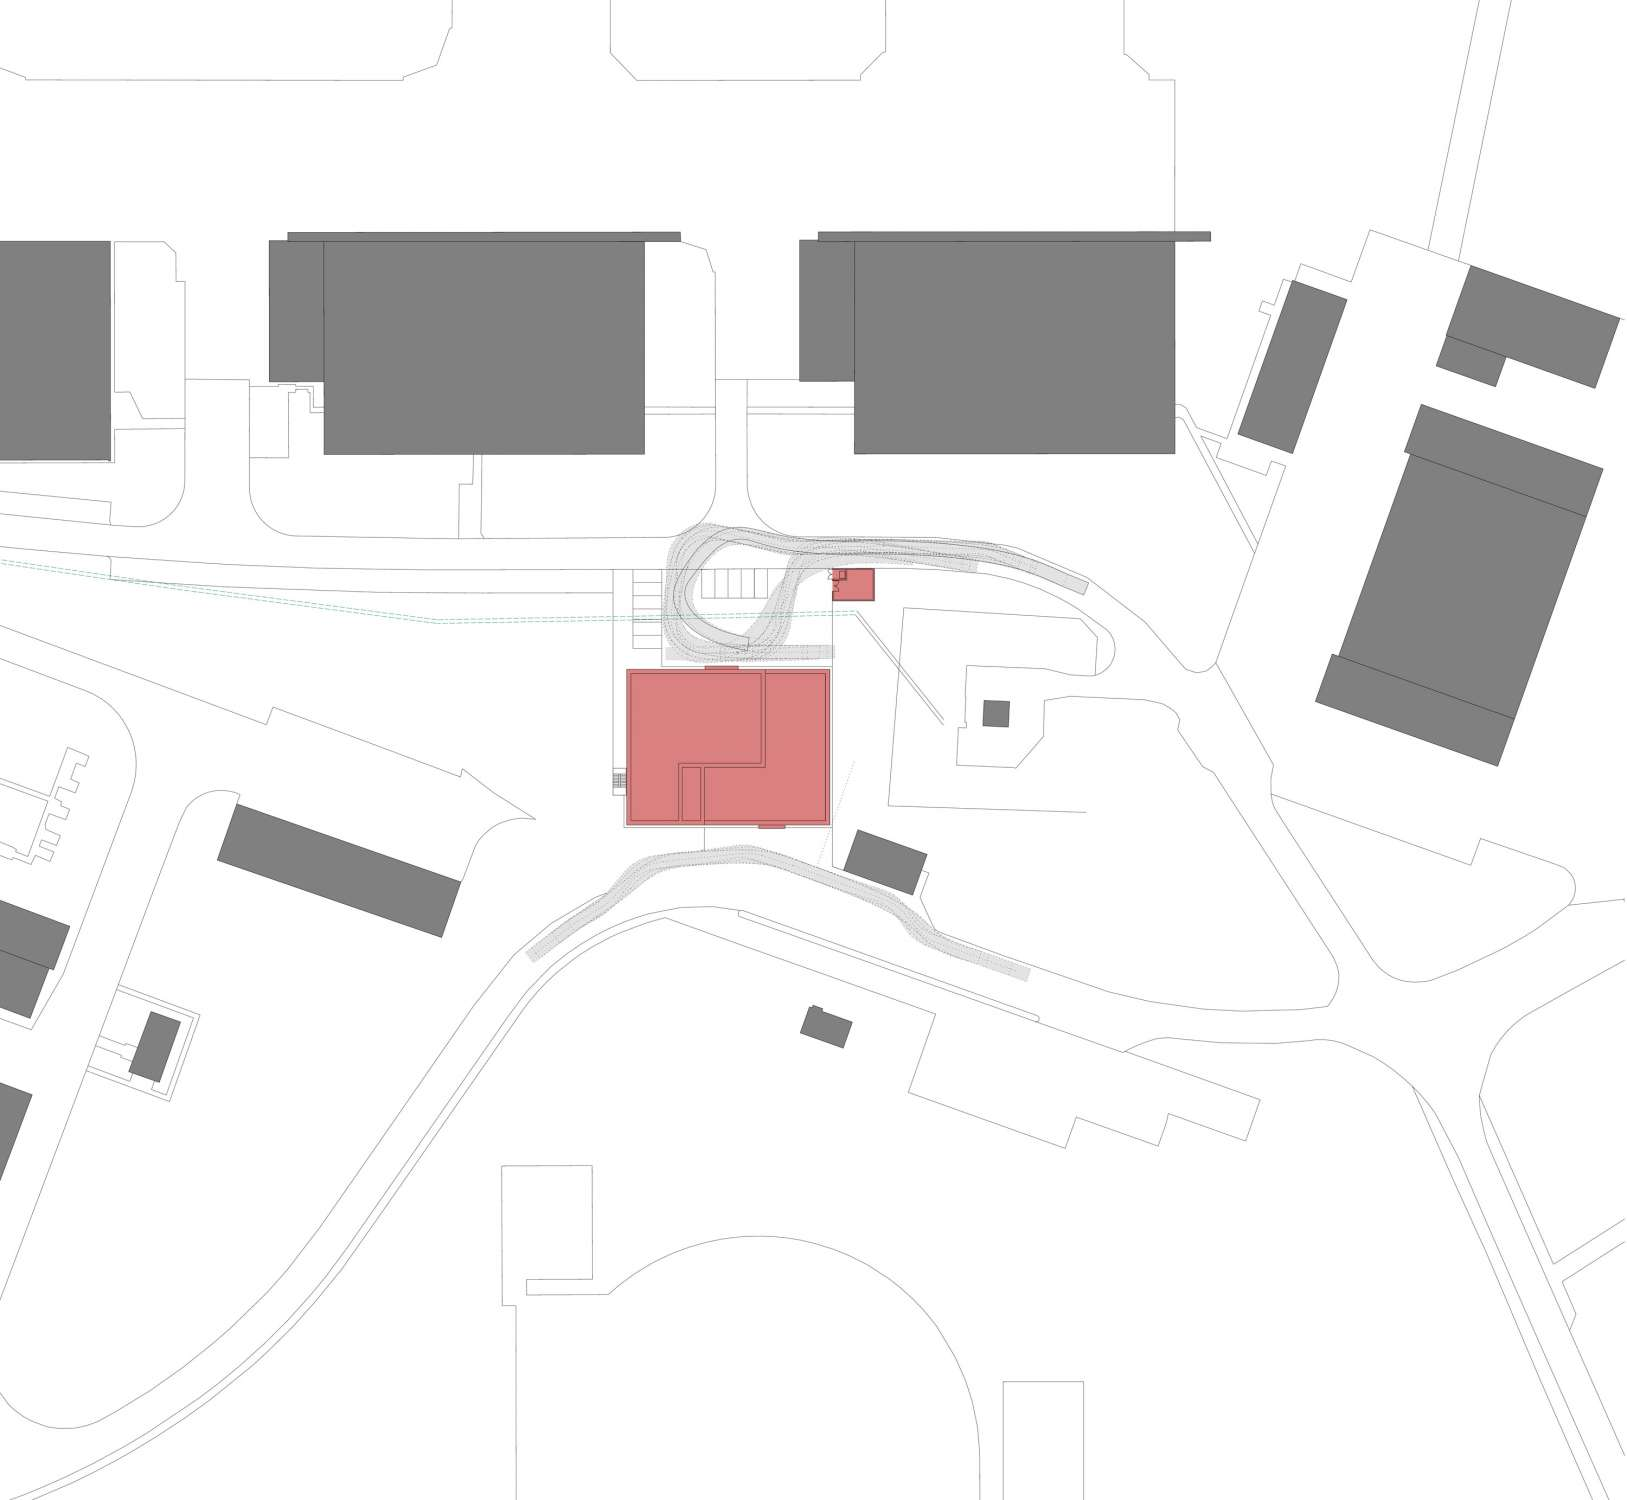 Flugplatz Laupheim, Neubau Lagergebäude (5)